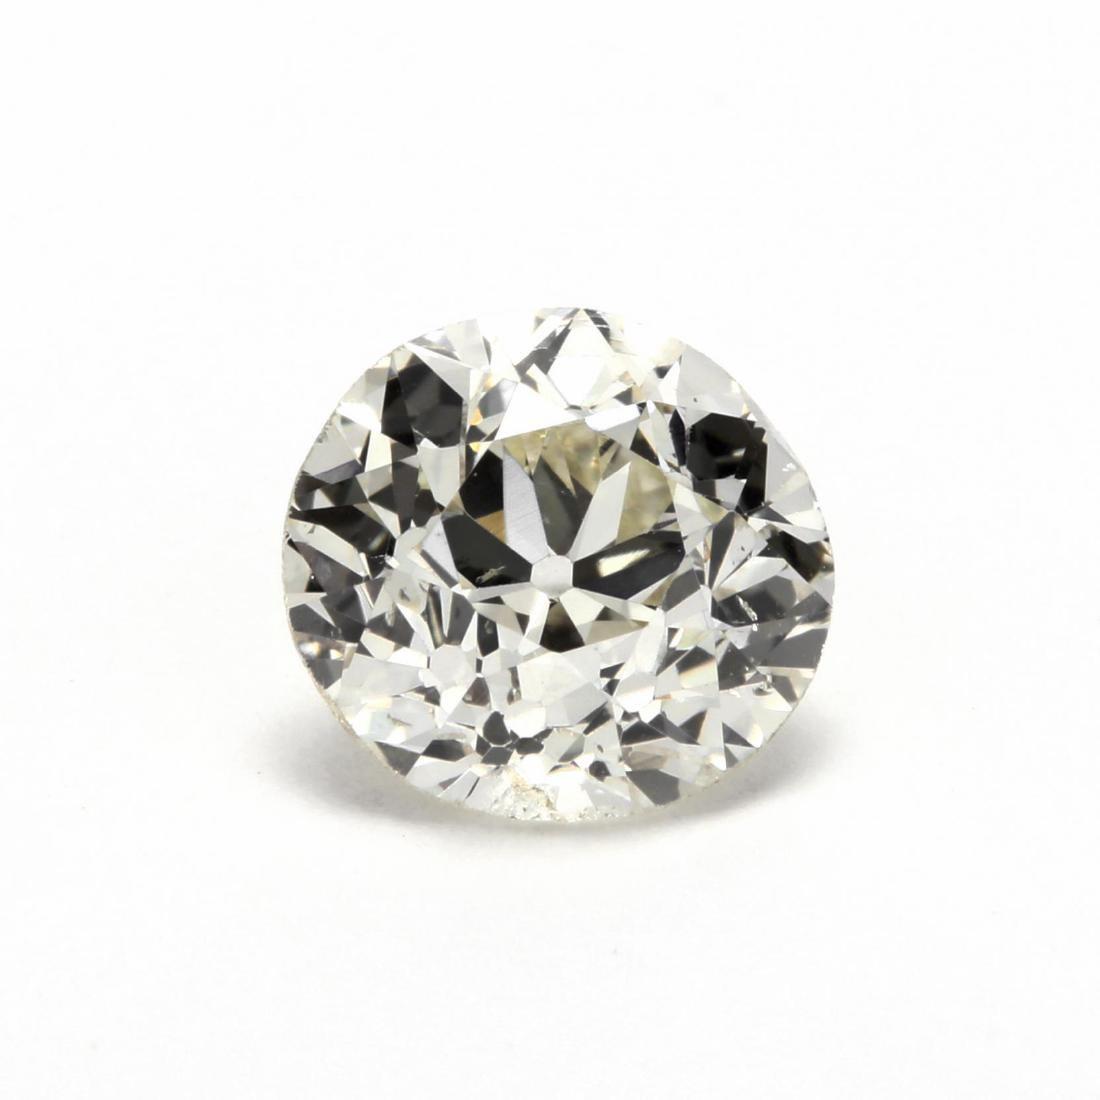 Old European Cut Near Colorless Diamond Simulant Cubic Zirconia Georgie